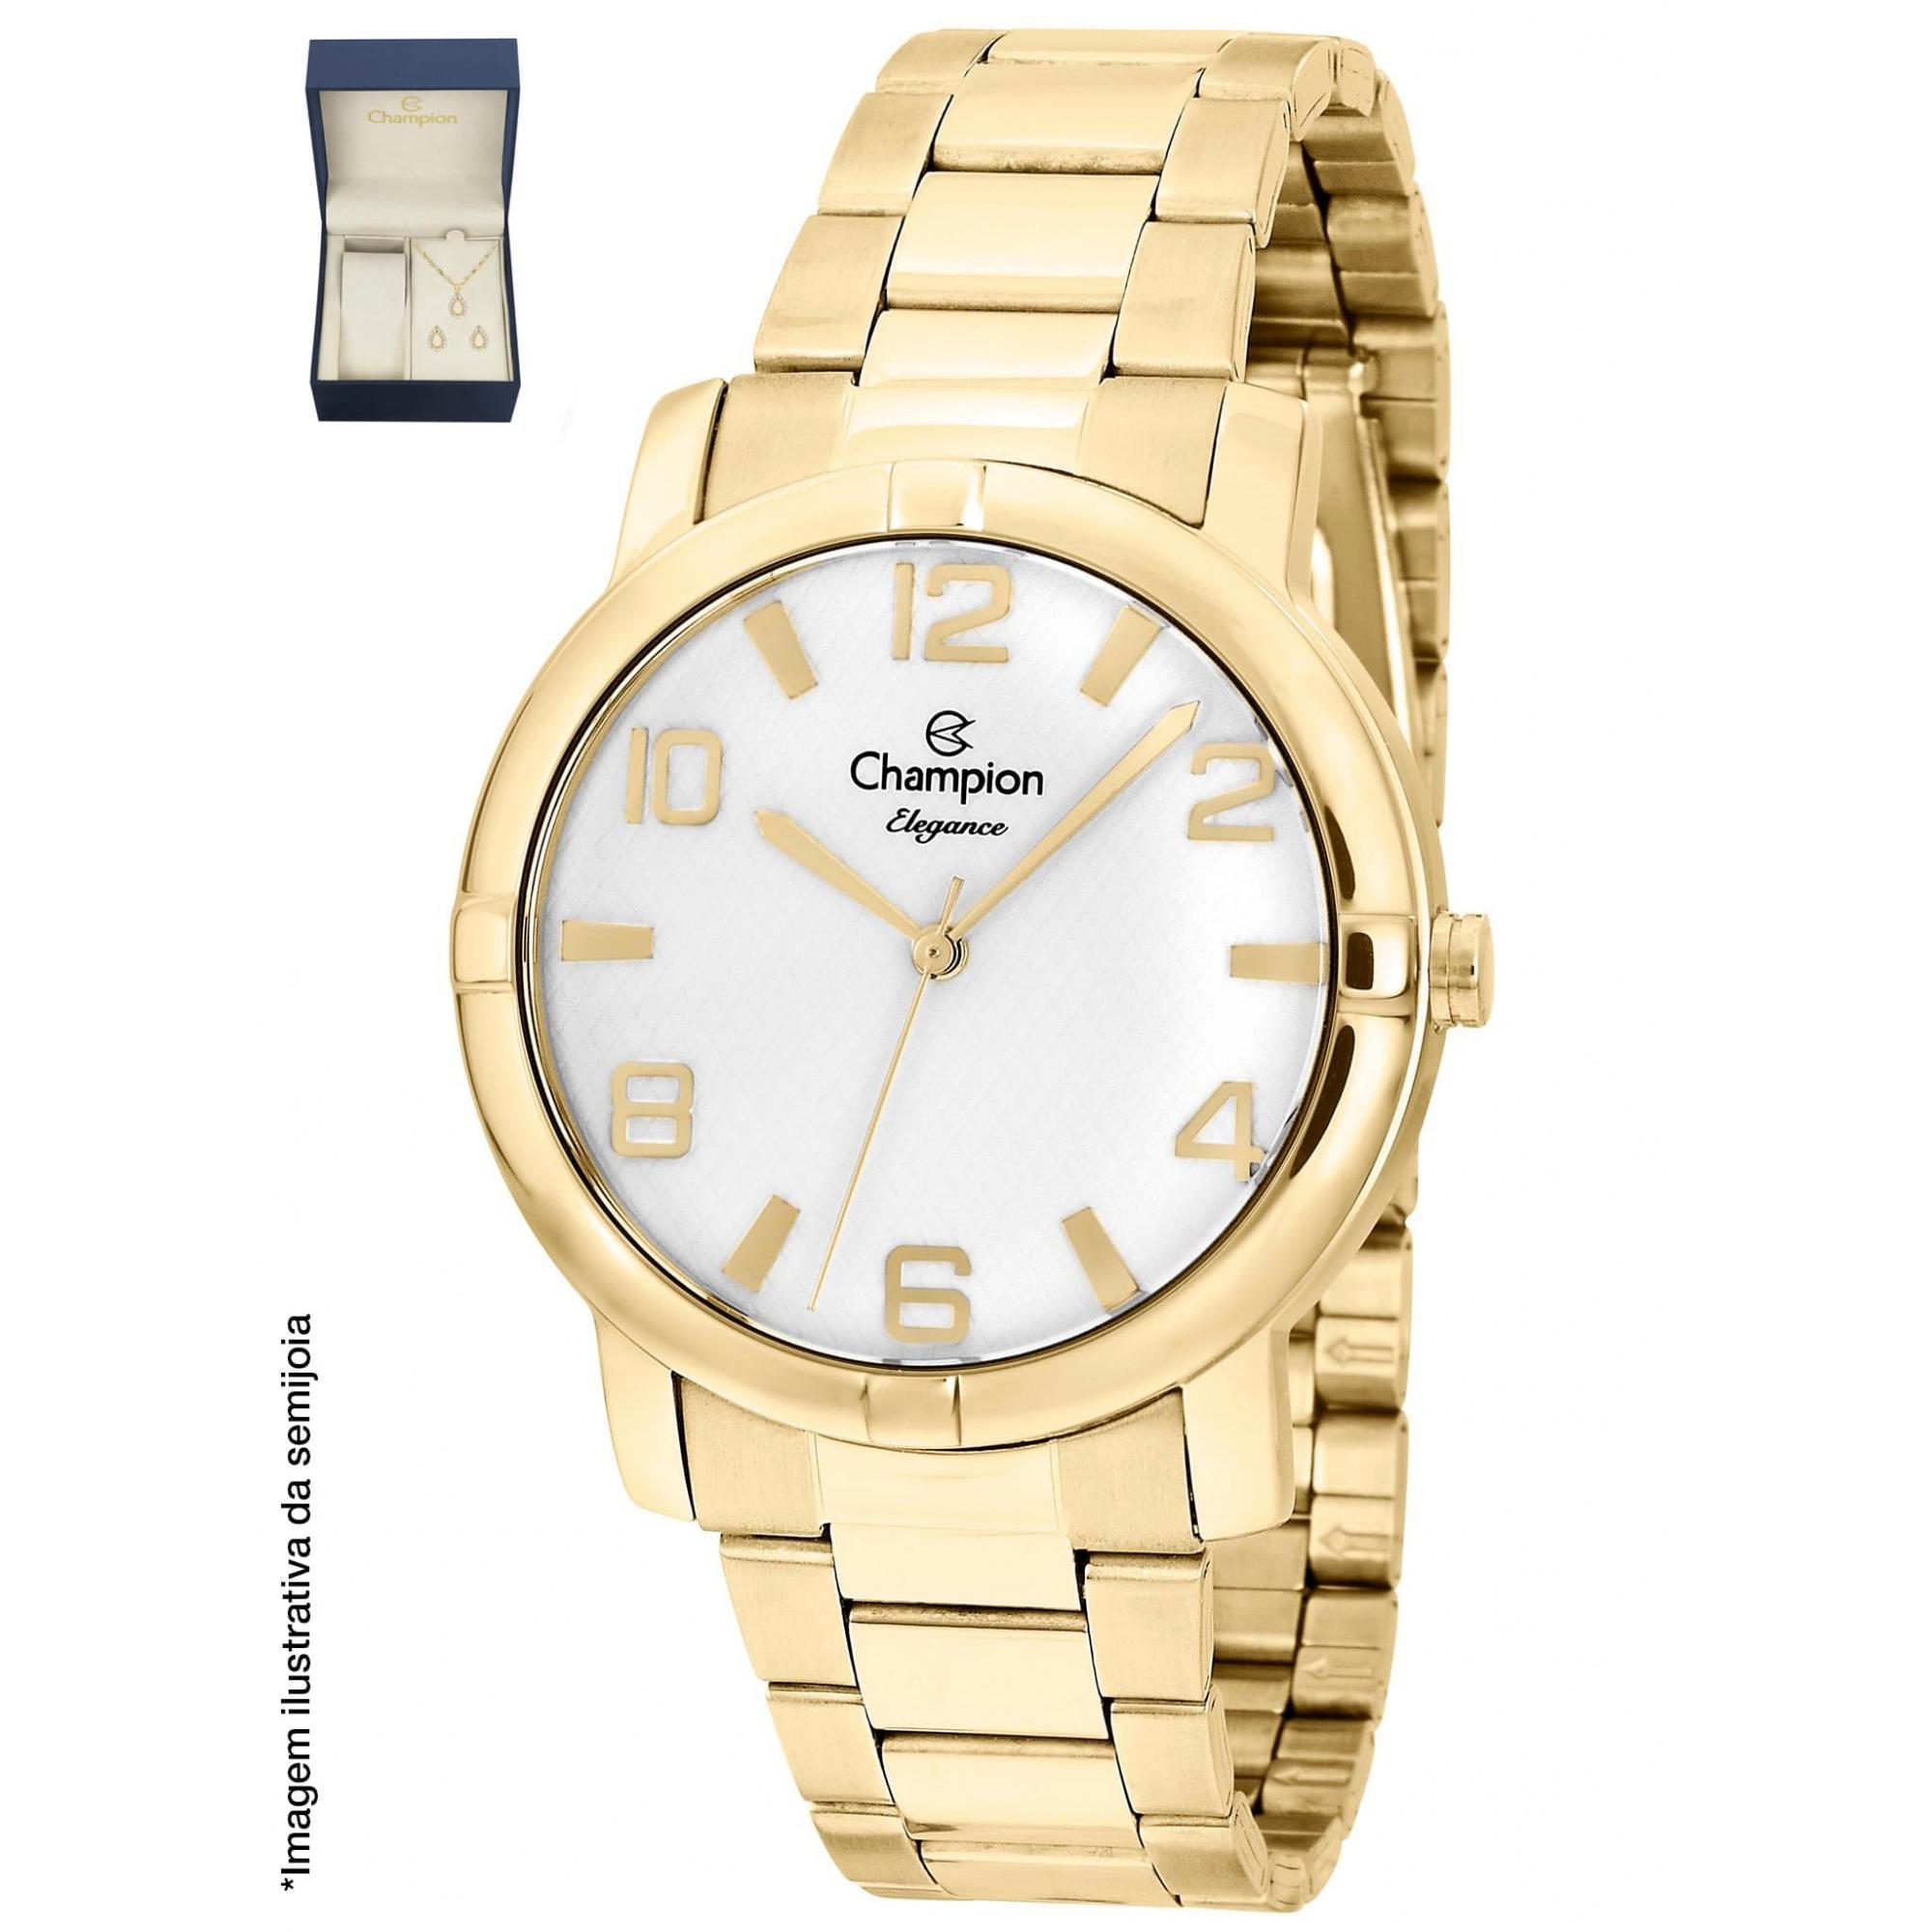 Relógio Champion Feminino Dourado + Kit Colar e Brincos - Elegance - CN25181W